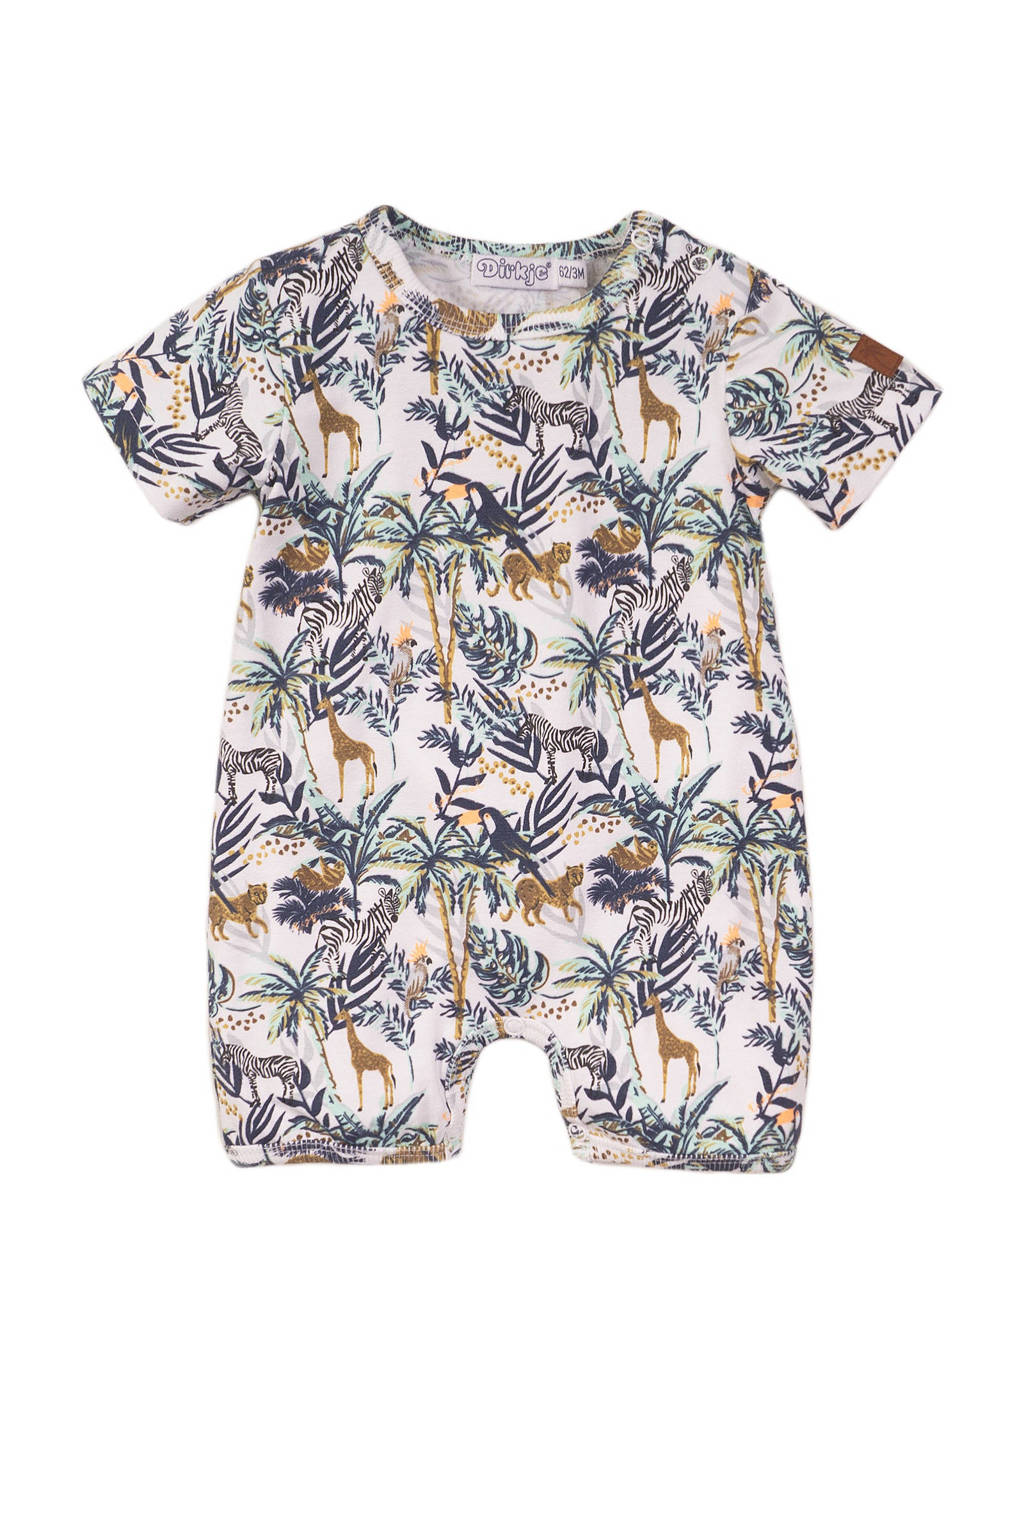 Dirkje baby boxpak met dierenprint blauw/wit/beige, Blauw/wit/beige